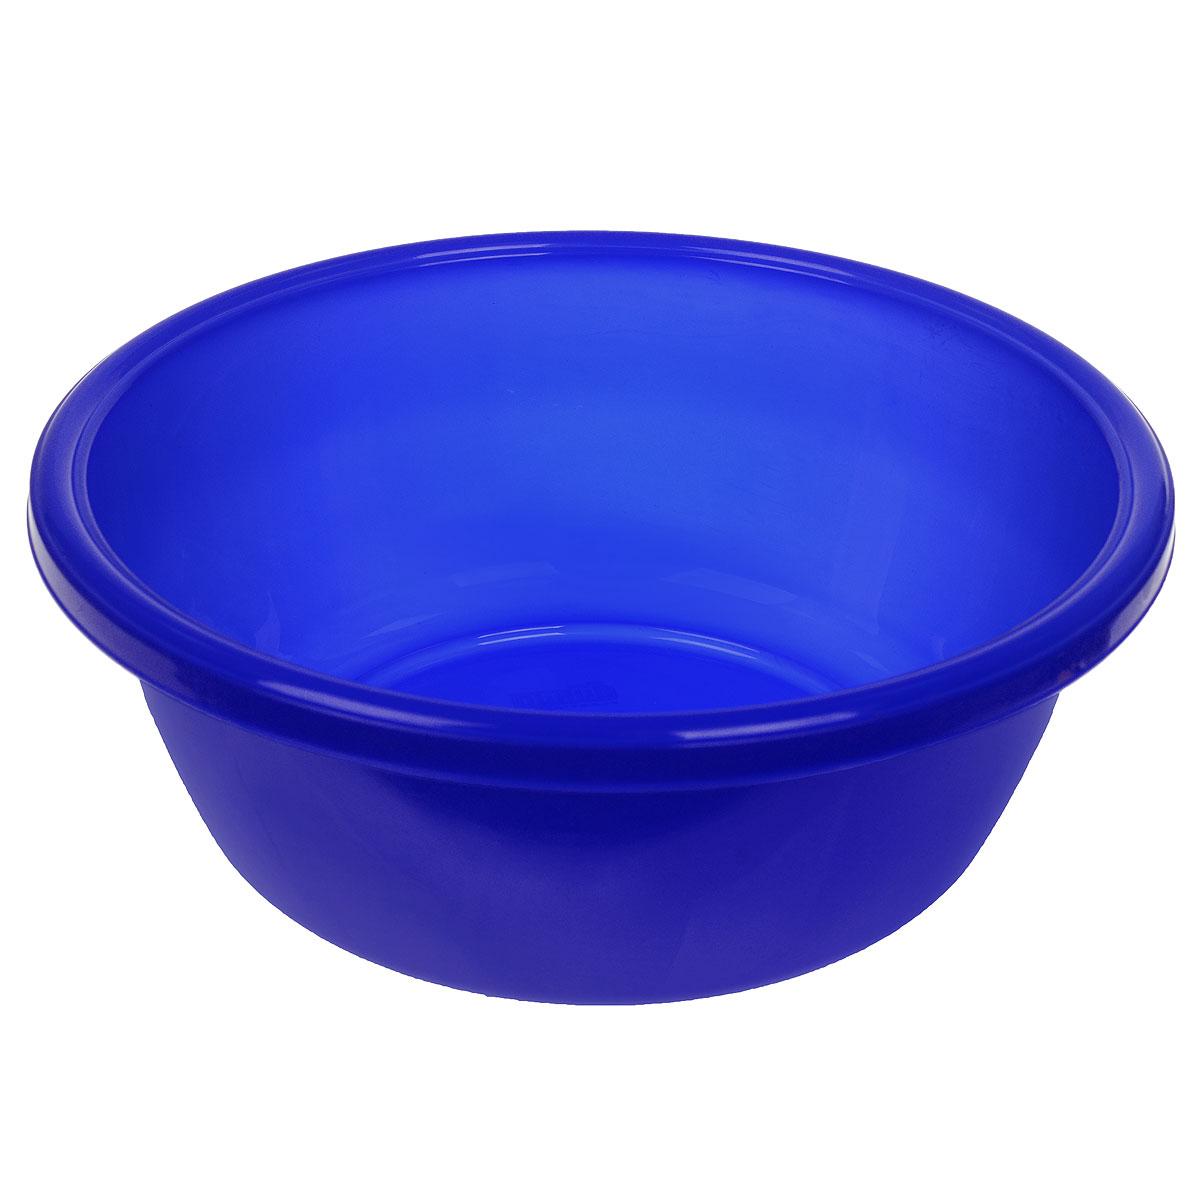 Таз Dunya Plastik, цвет: синий, 7 л контейнер dunya plastik цвет синий прозрачный 2 20 л